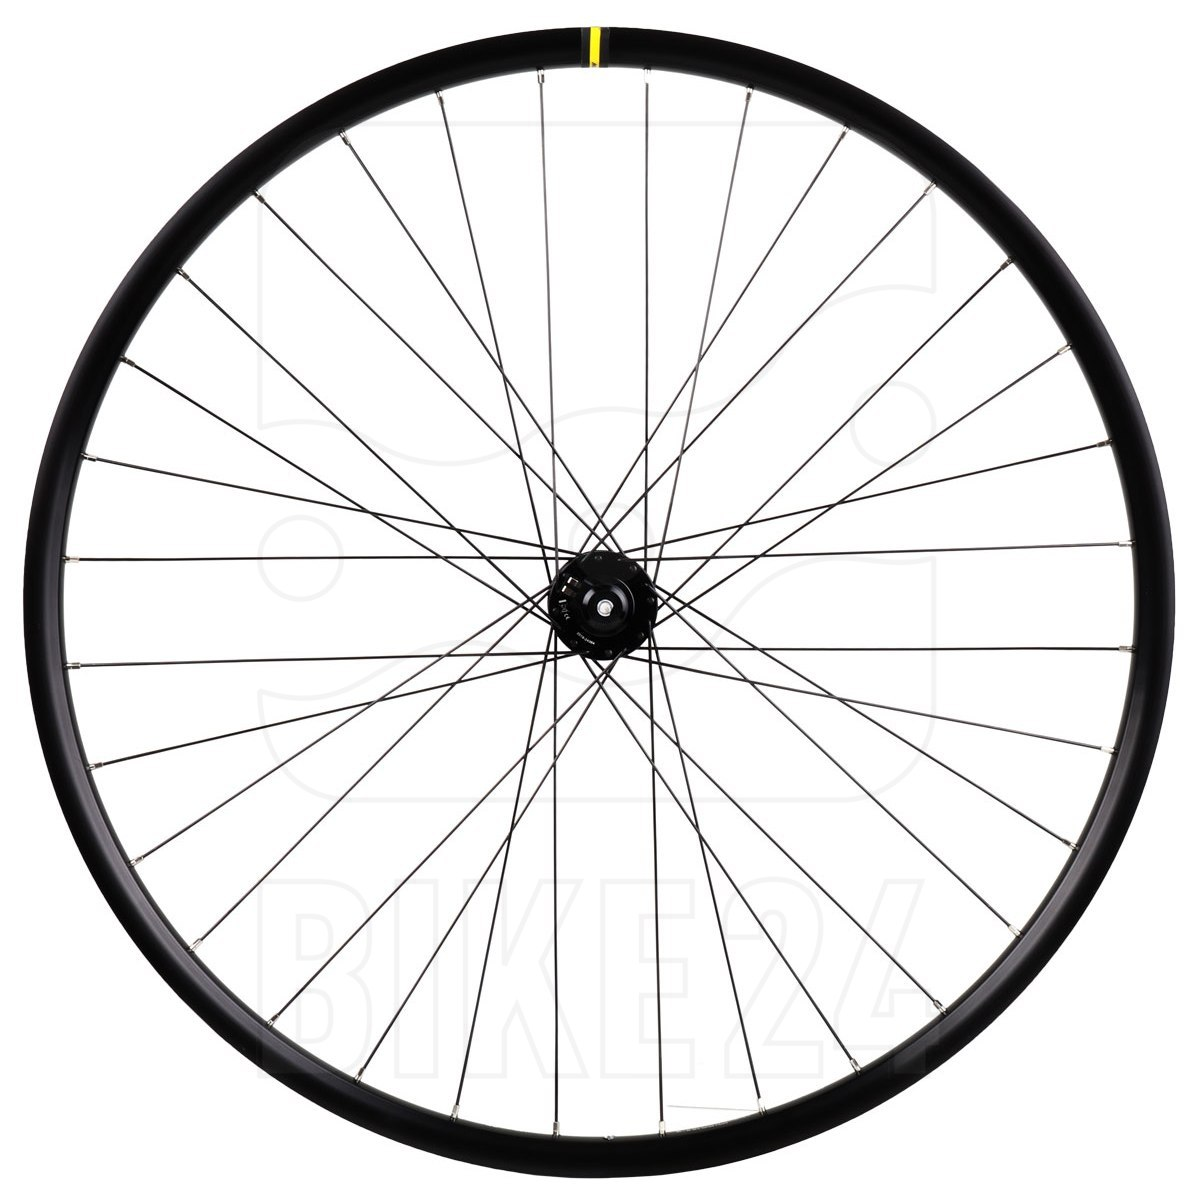 Image of Shutter Precision   Mavic - PL-8   XC 321 - 28 / 29 Inches Front Wheel with Hub Dynamo - Centerlock - QR